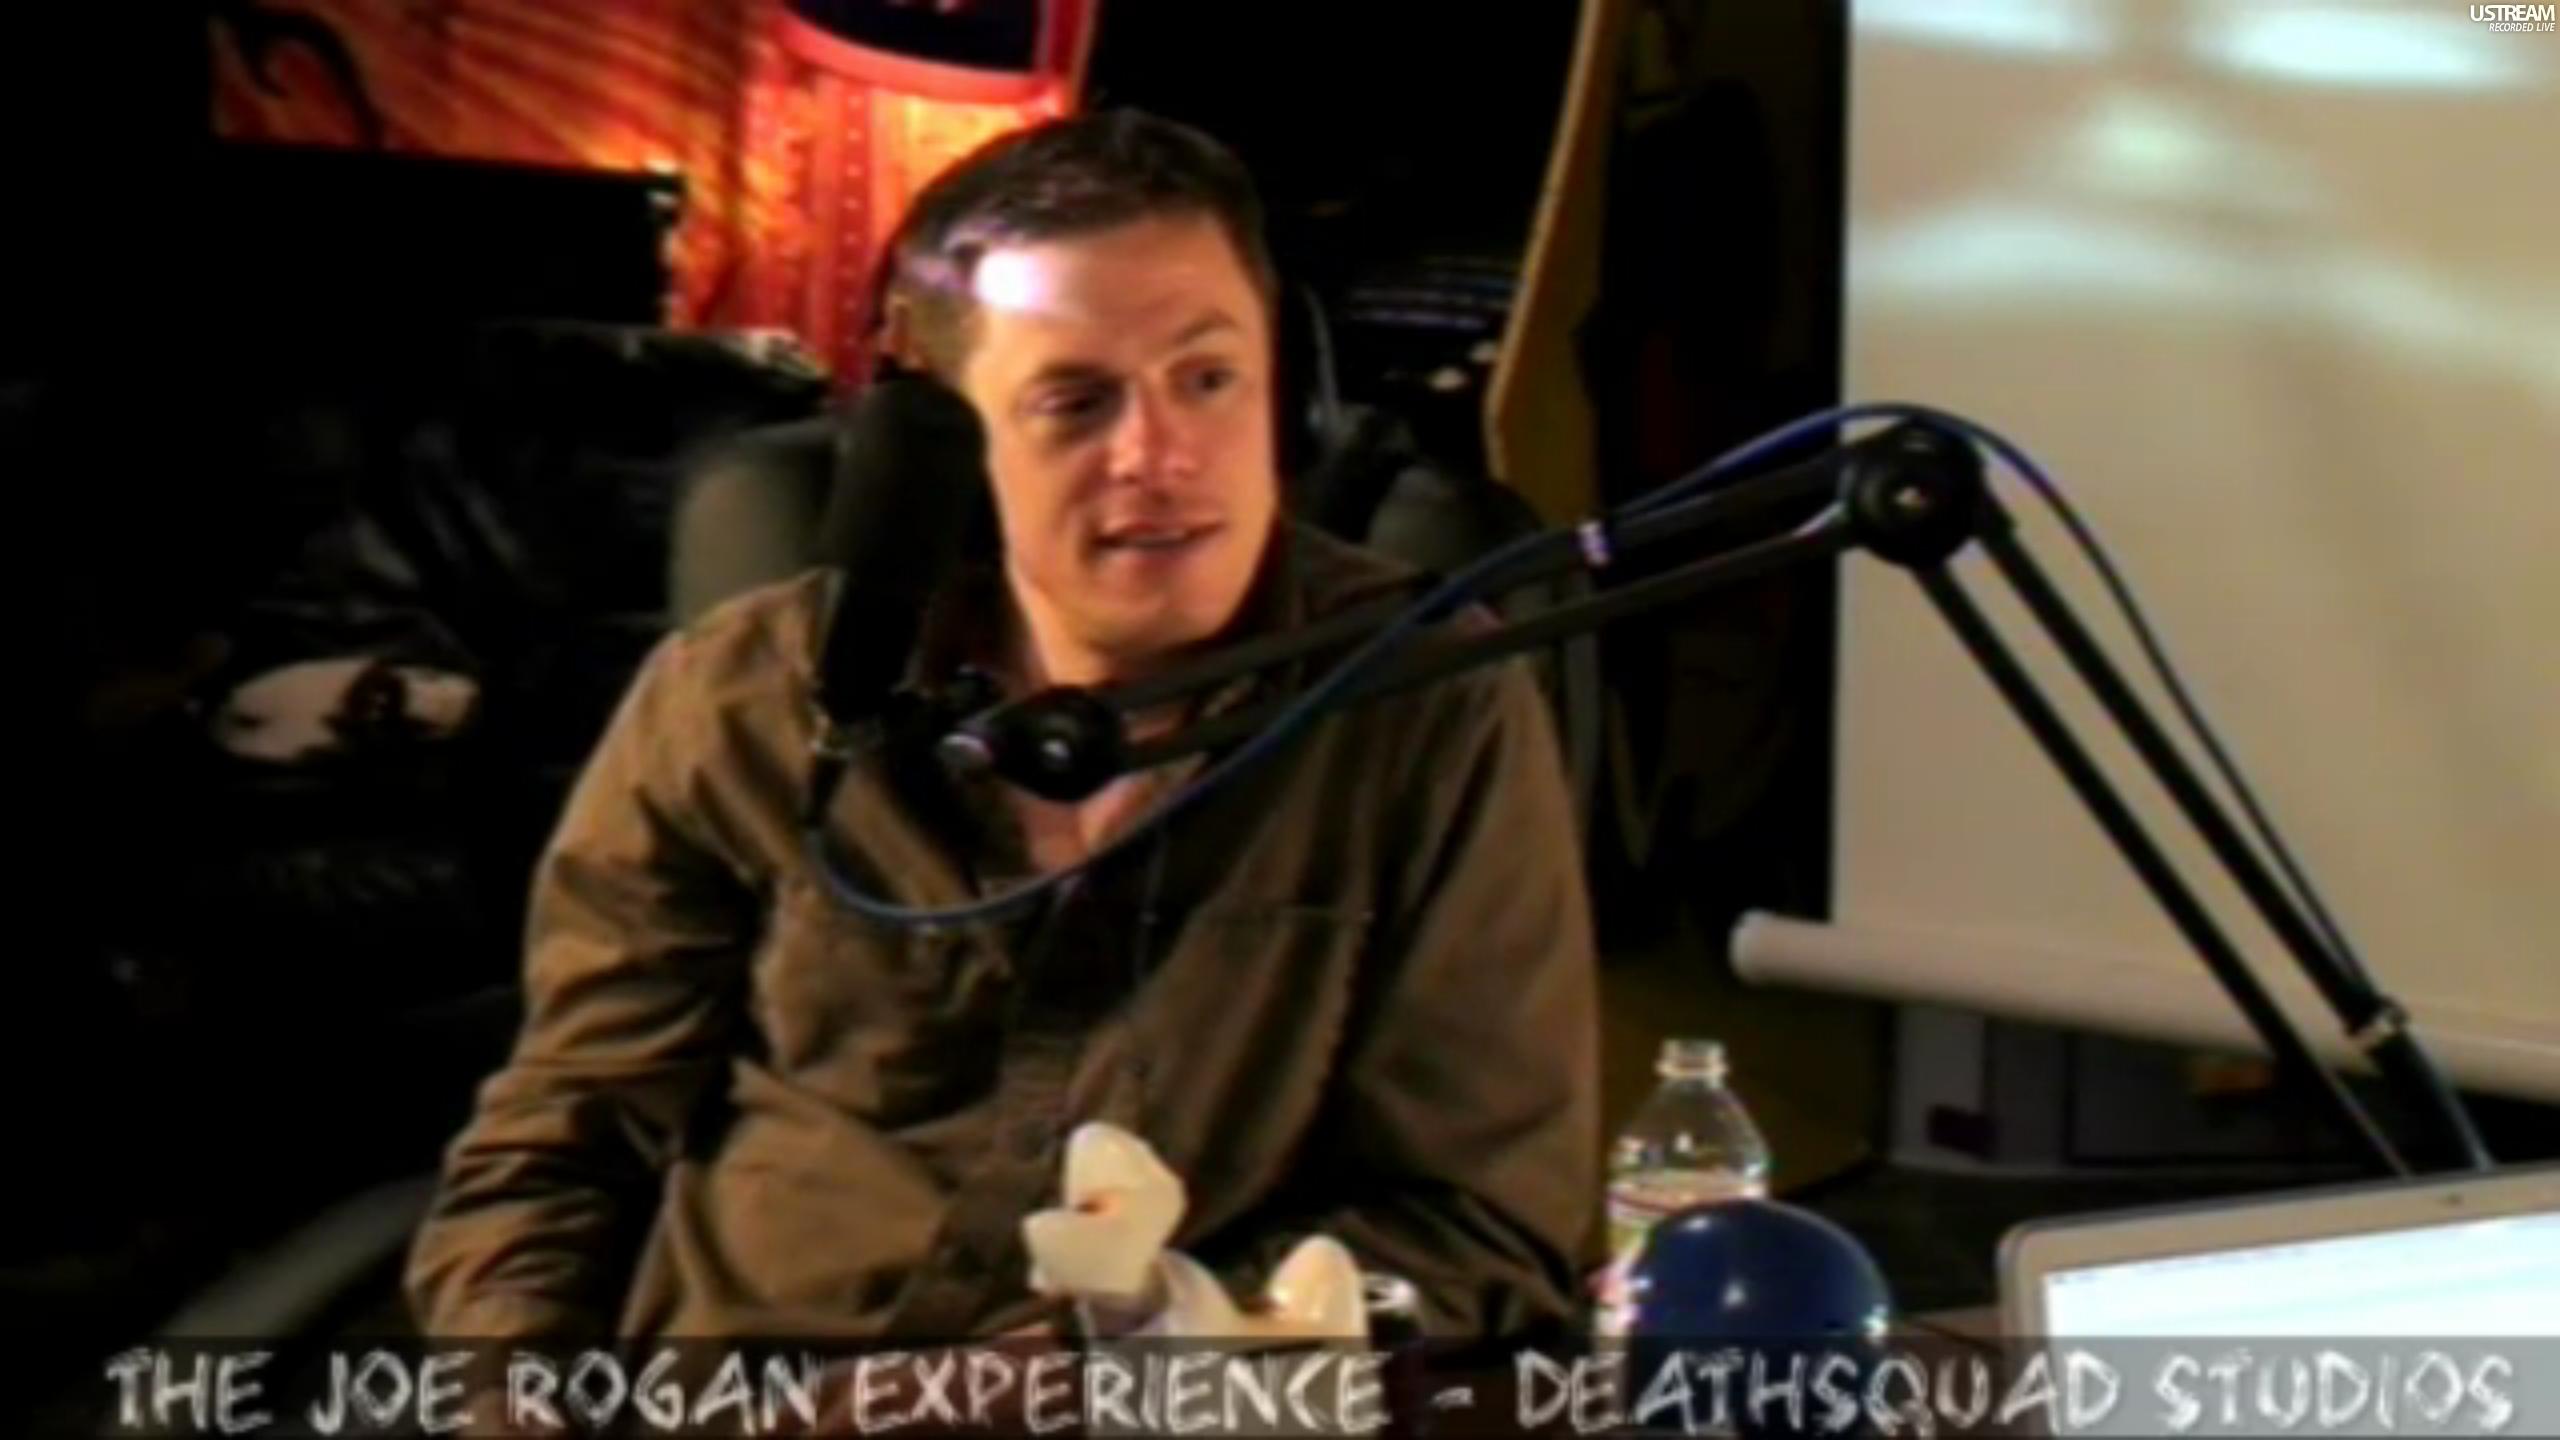 The Joe Rogan Experience PODCAST #176 - Steven Rinella, Brian Redban